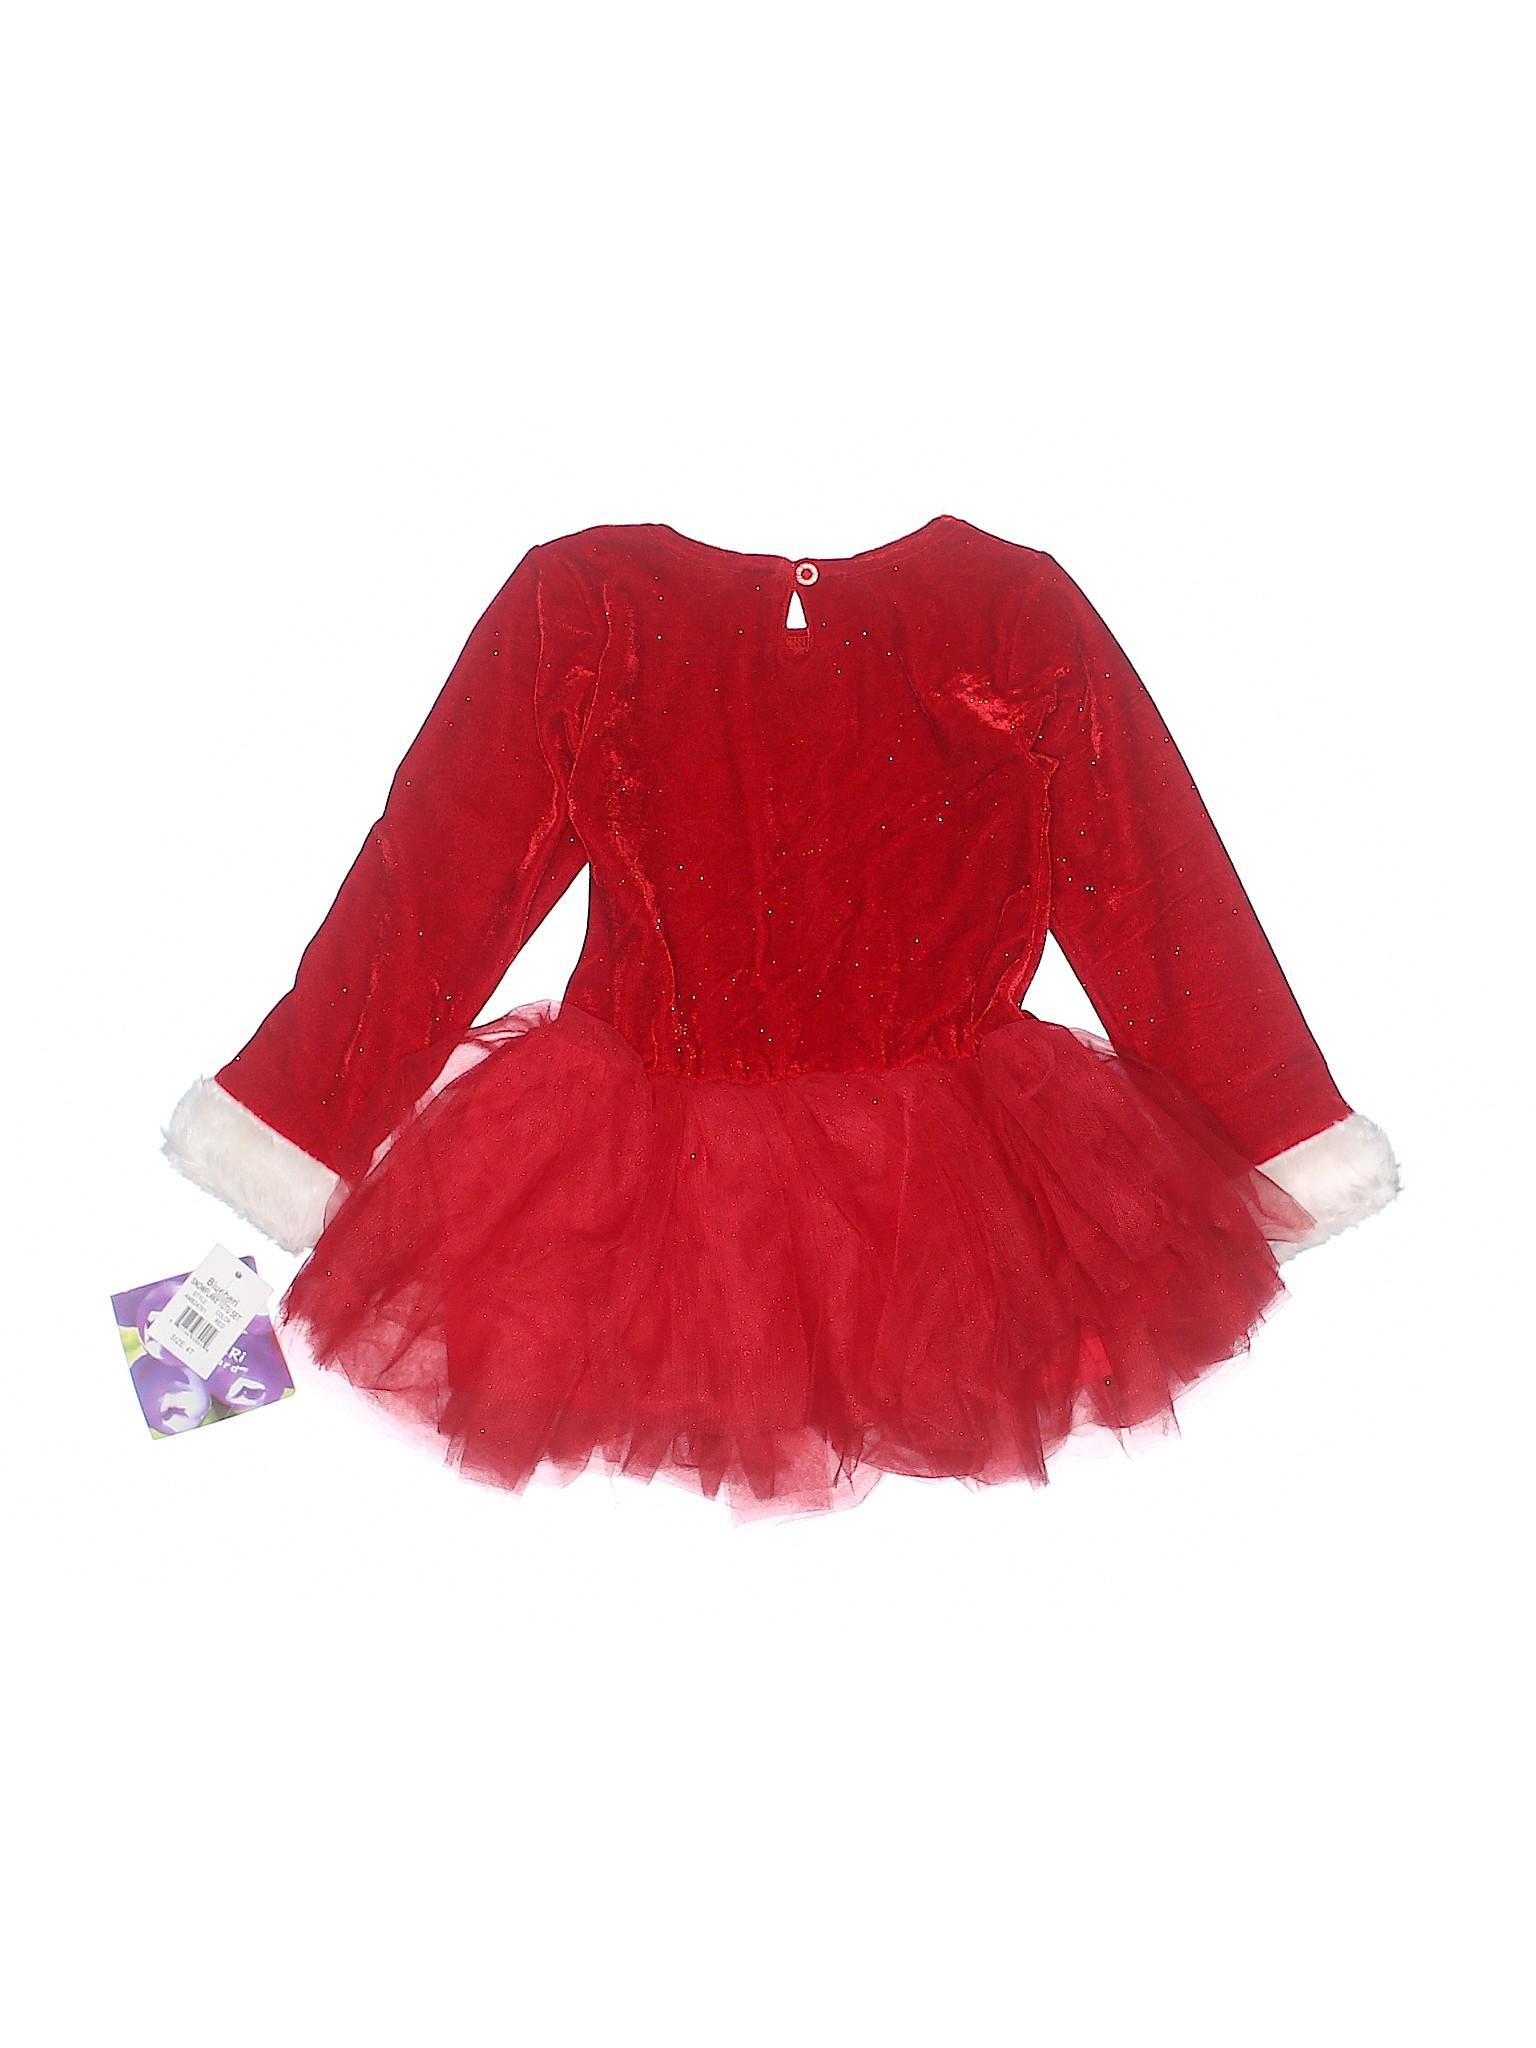 2da4f28b Blueberi Boulevard Graphic Red Dress Size 4T - 64% off | thredUP